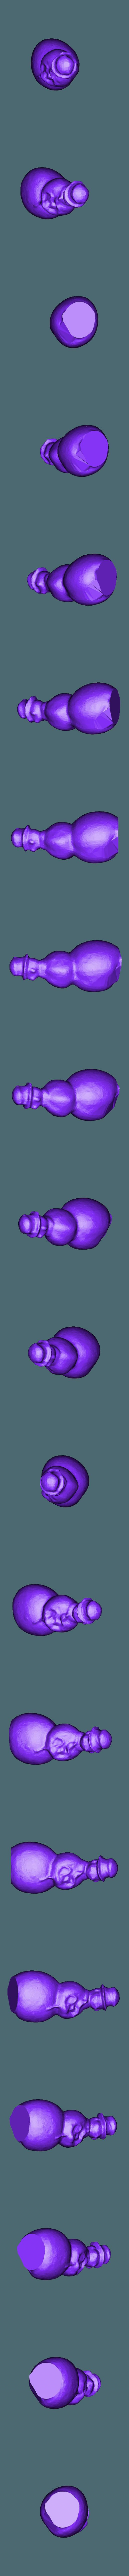 snow_man_low_poly_43ht.stl Download free STL file 3d scann of old outdoor snowman • 3D print design, liggett1